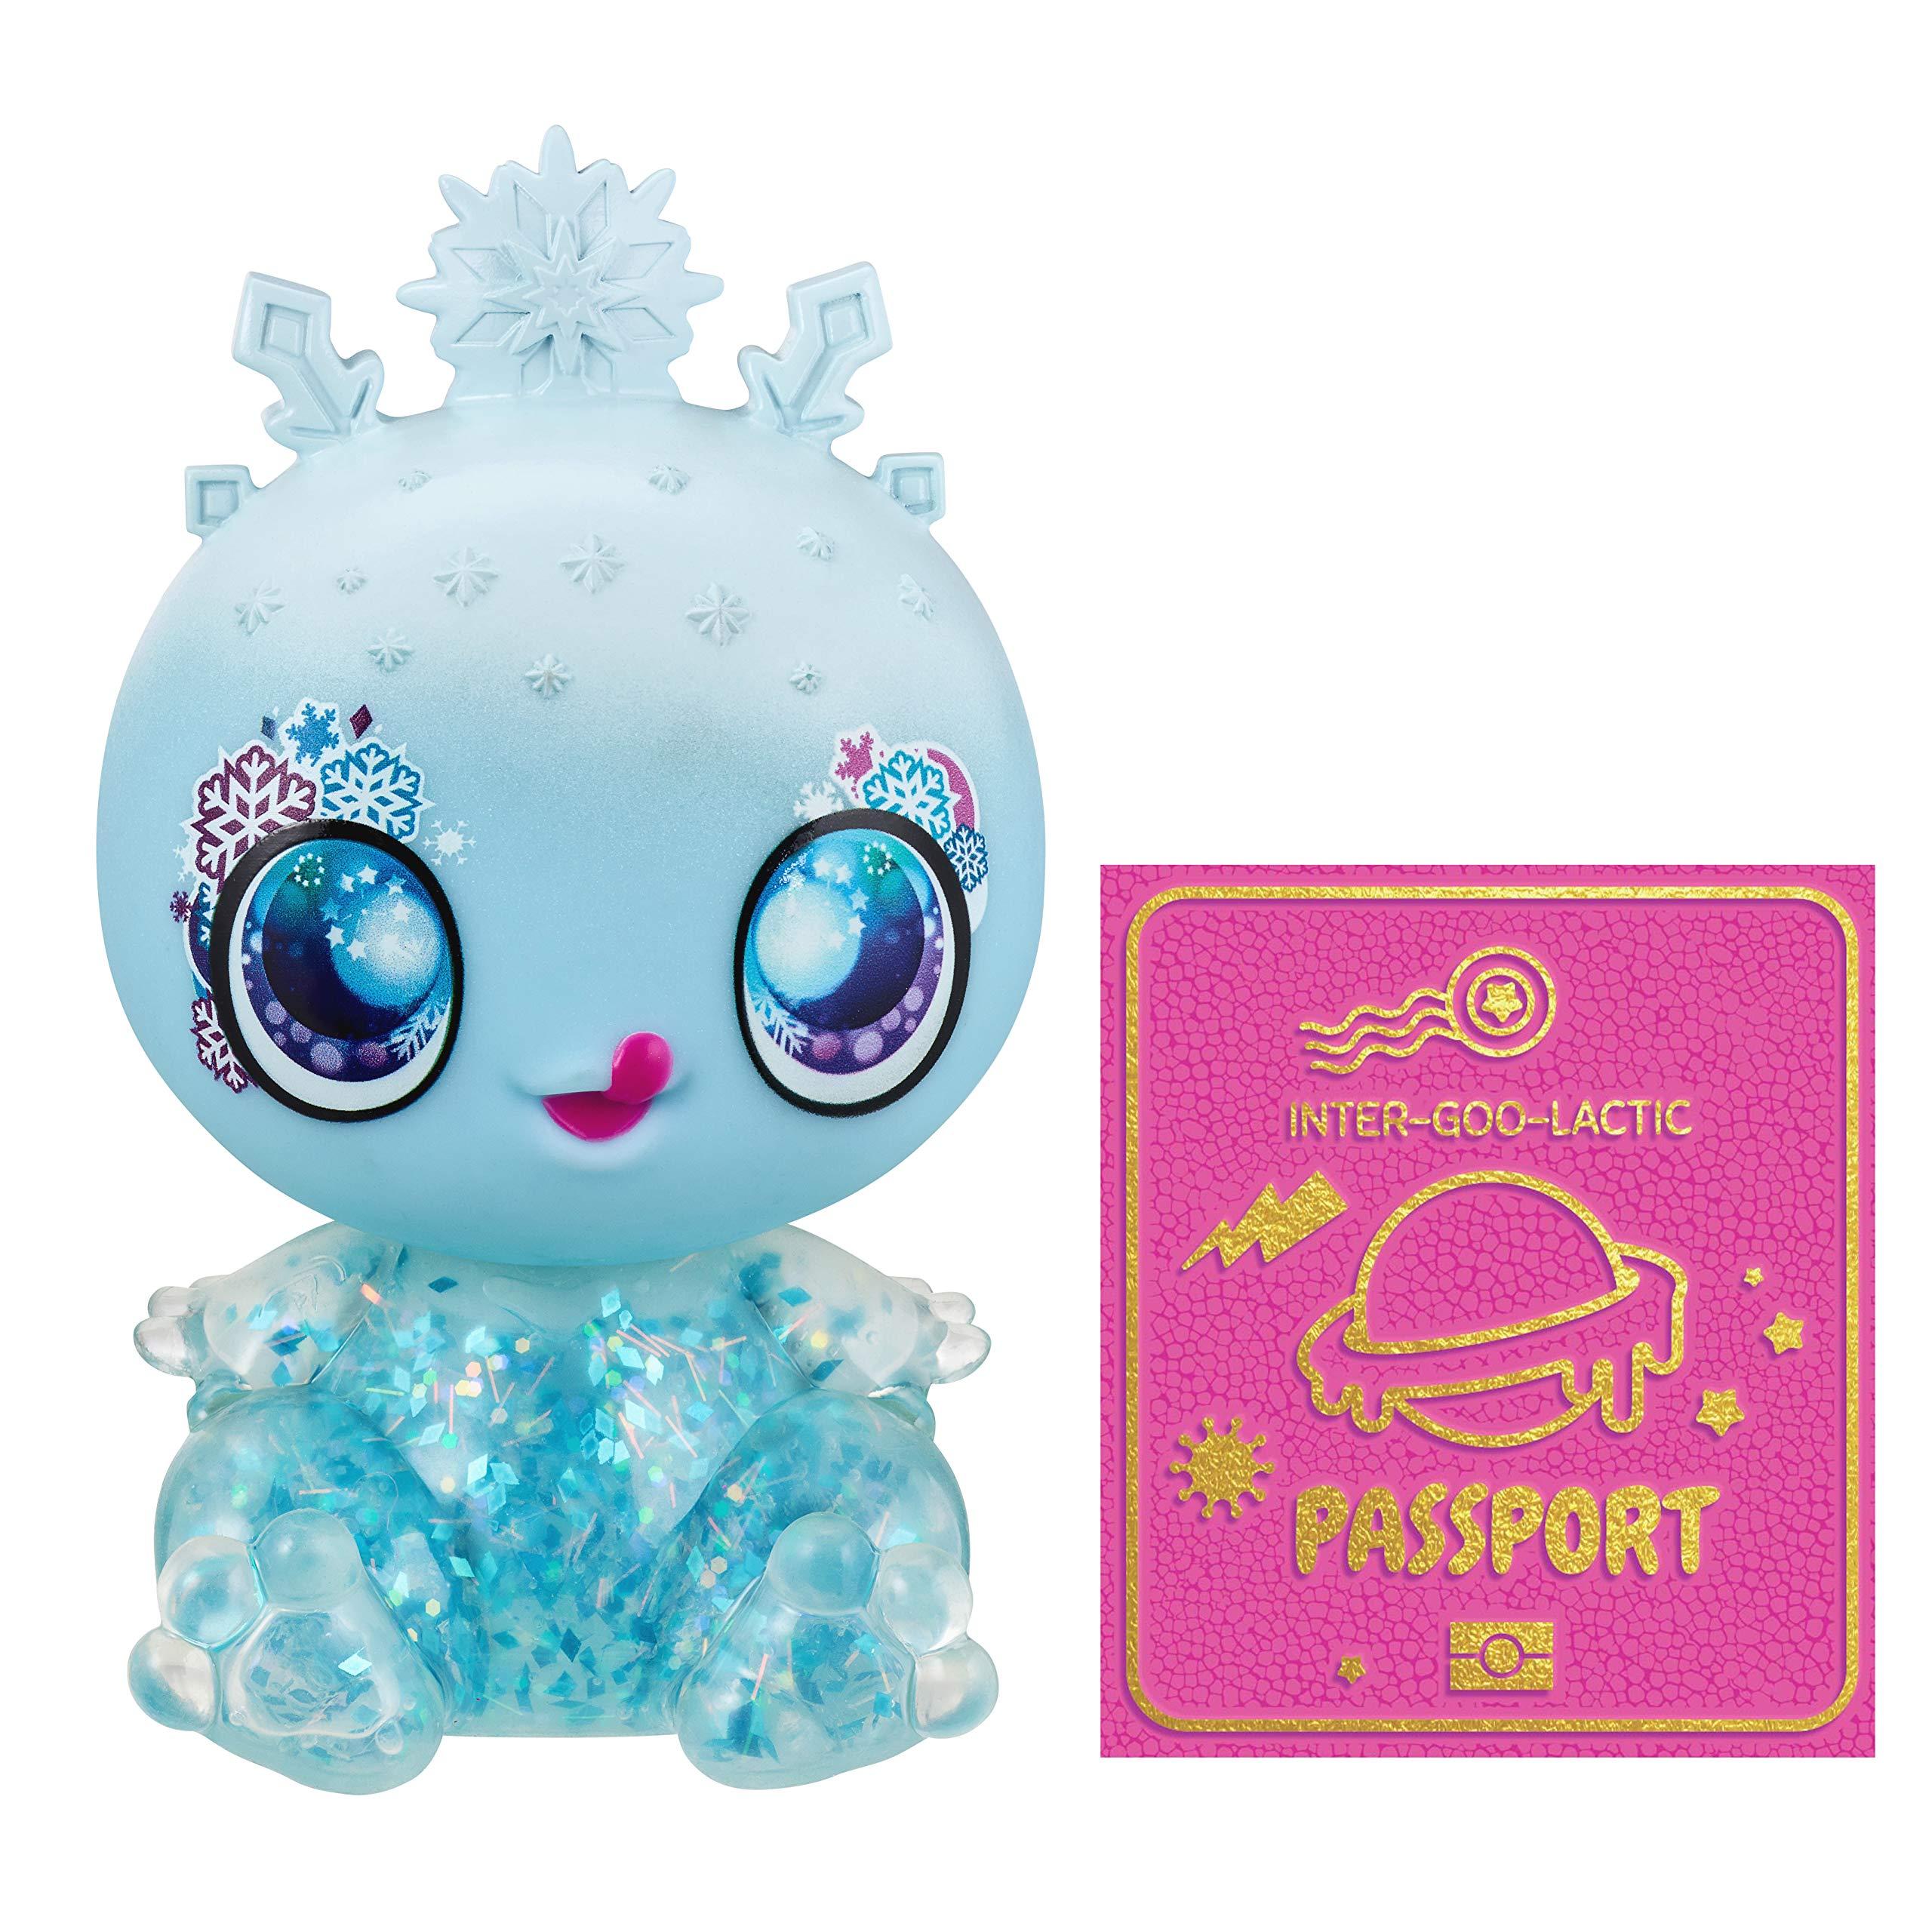 Goo Goo Galaxy - Snow Glow Goo Drop Doll, 5.5 inch Small Doll with Squishy Goo Filled Light-up Body